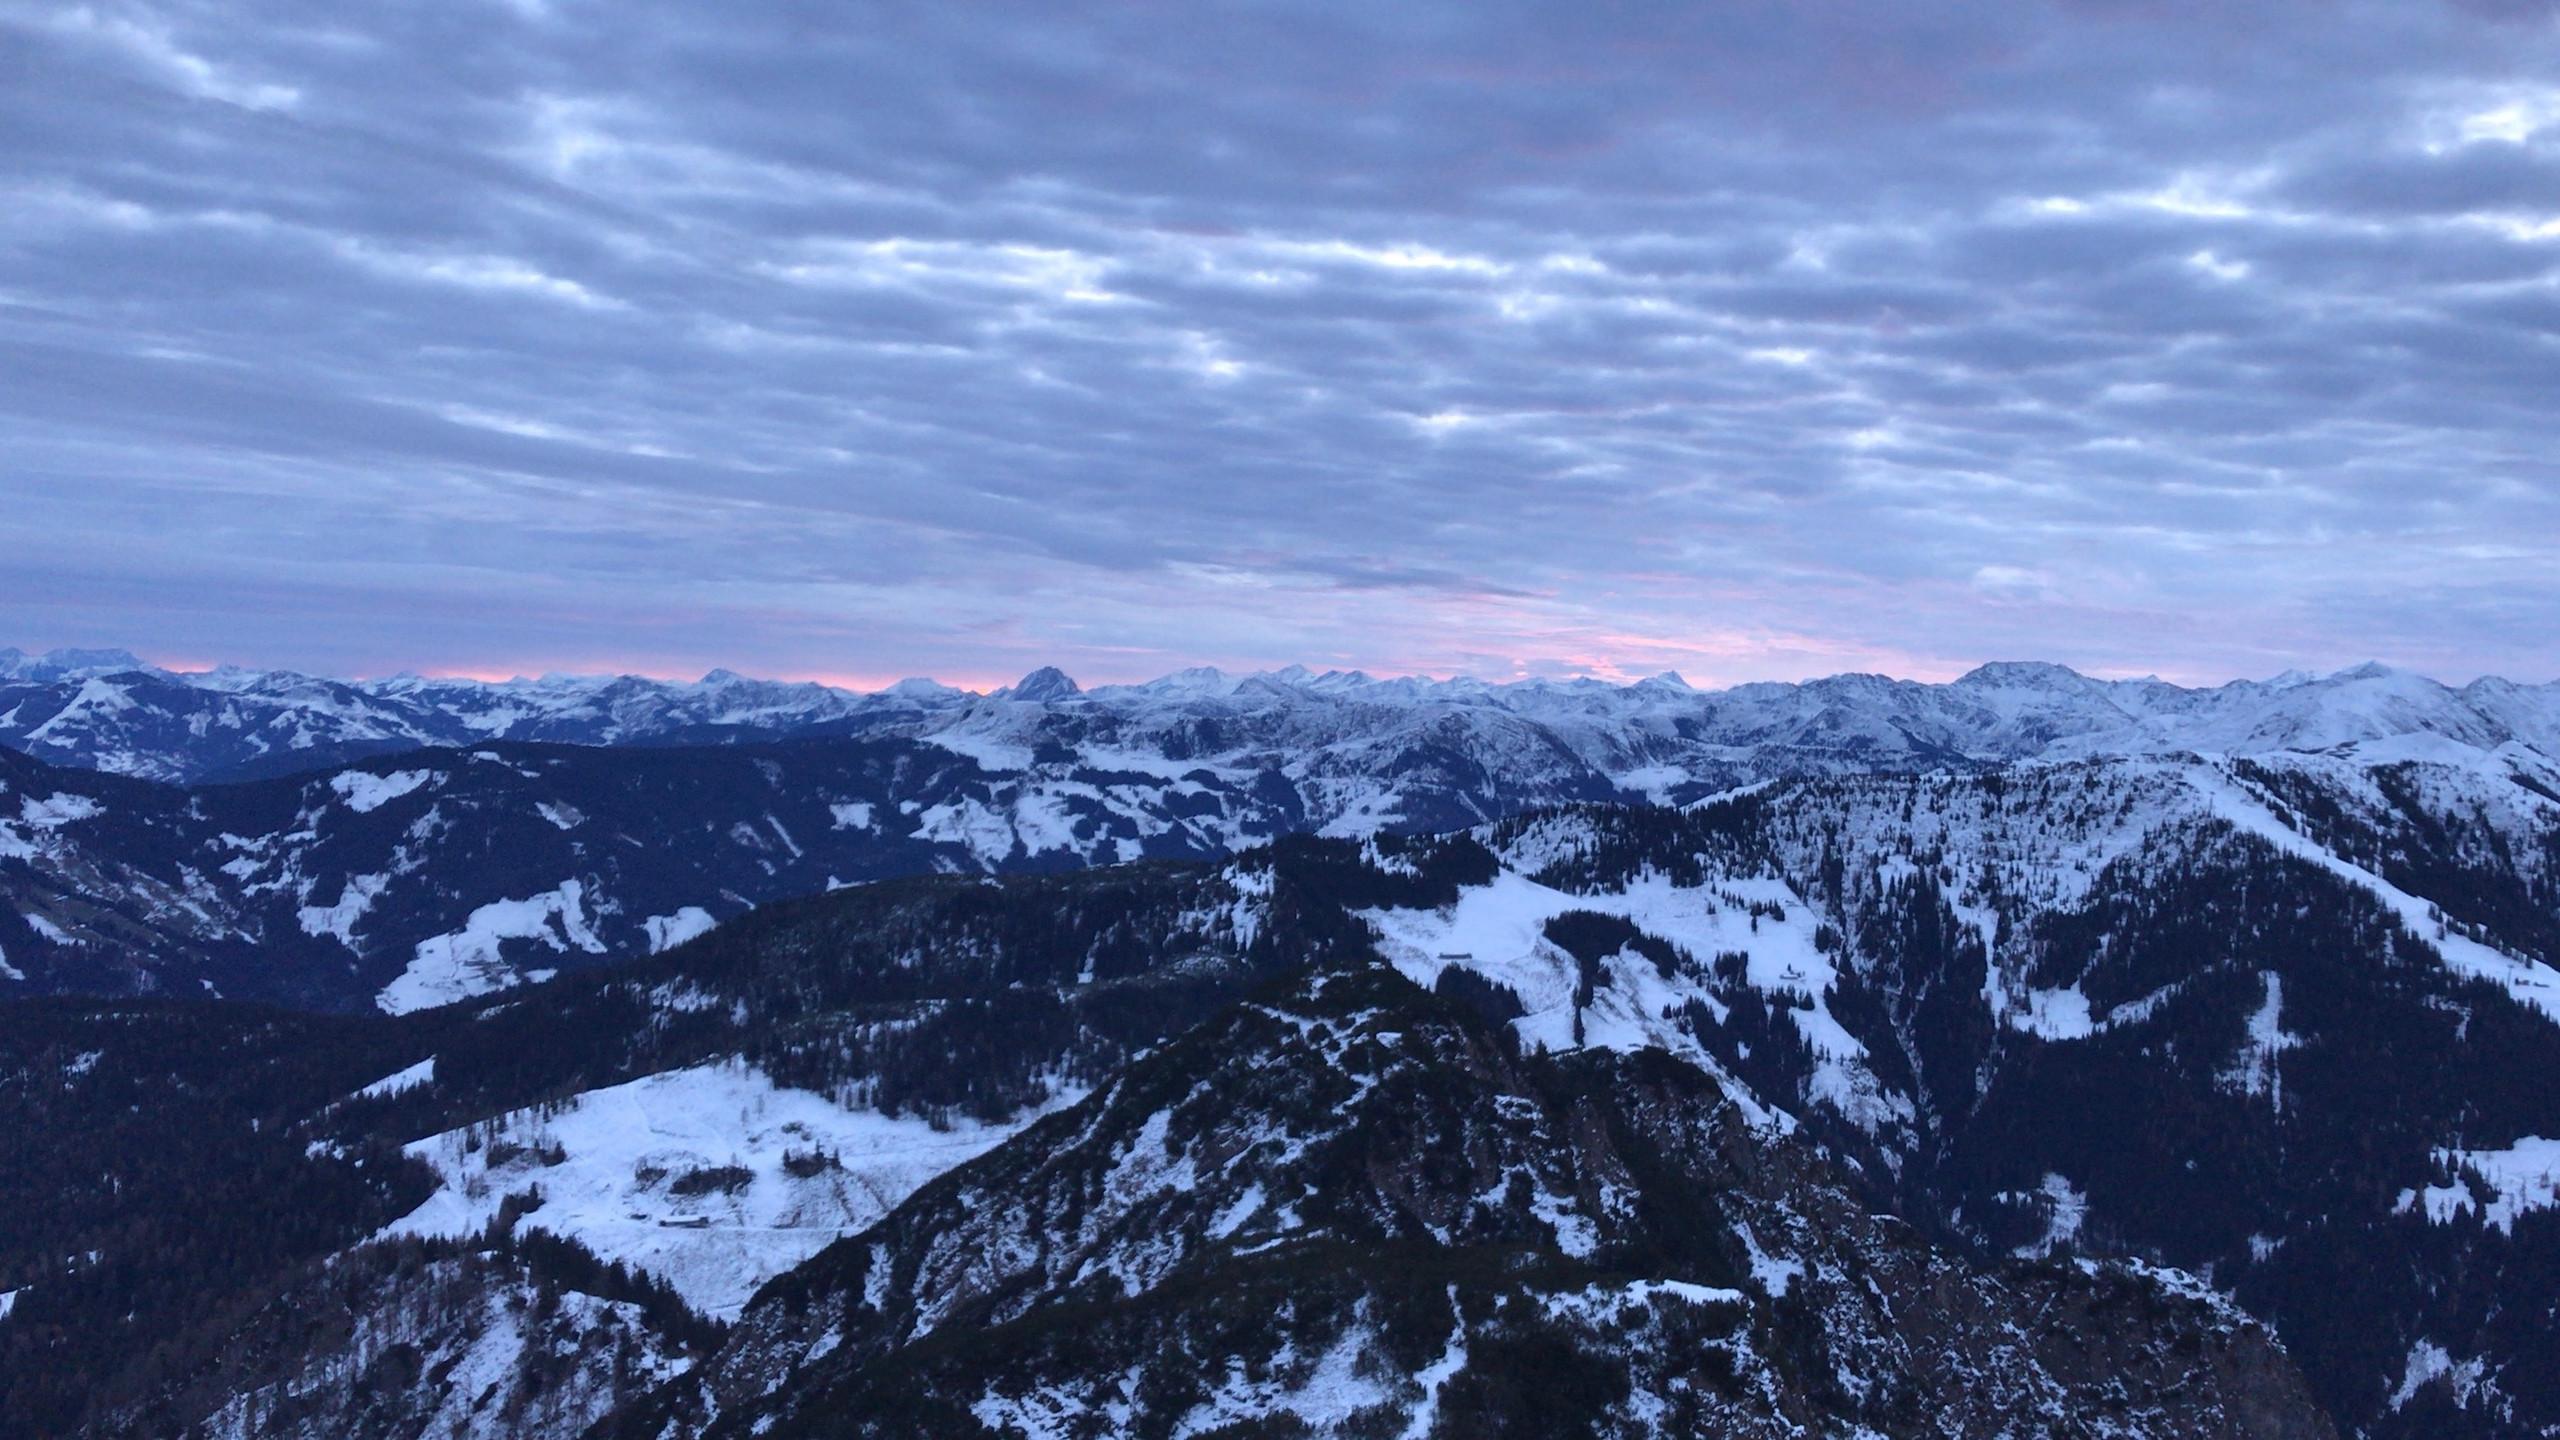 Sonnenaufgang im Wintertraum, Sonnenaufgangstour Alpbachtal